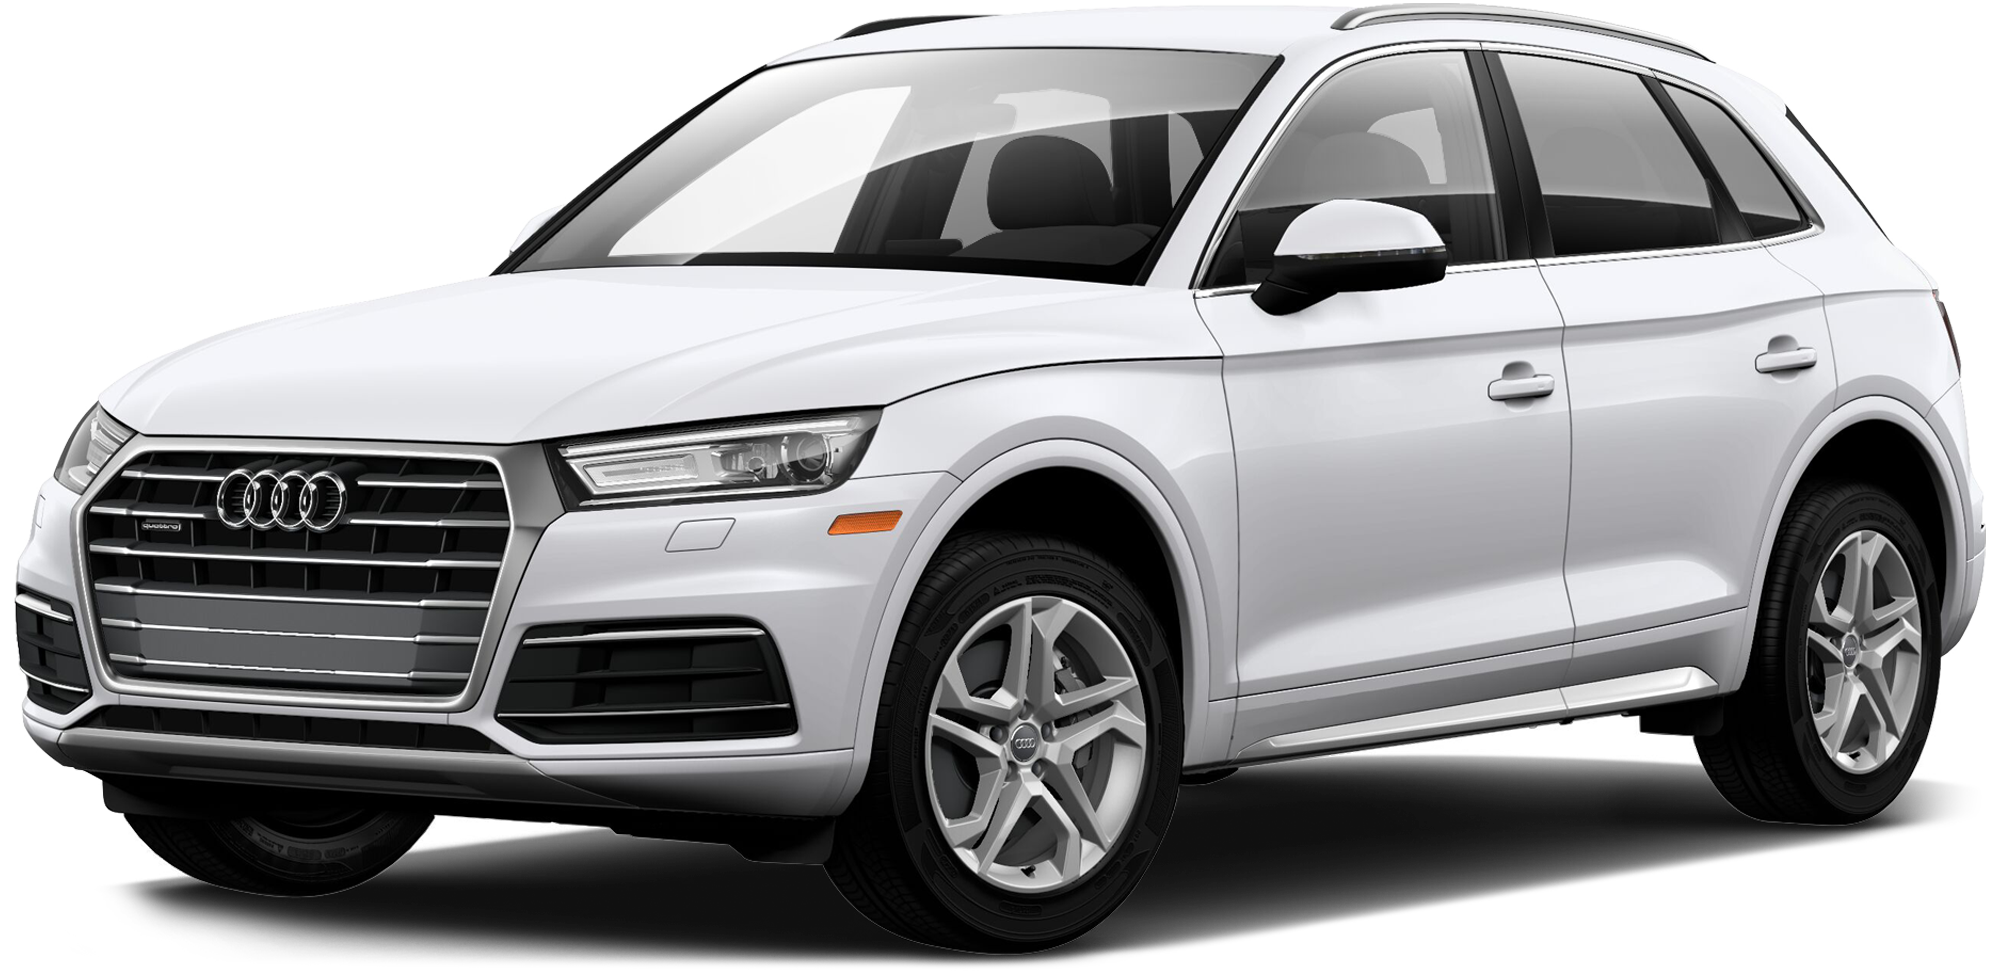 New 2019 Audi Q5  at Audi Calabasas